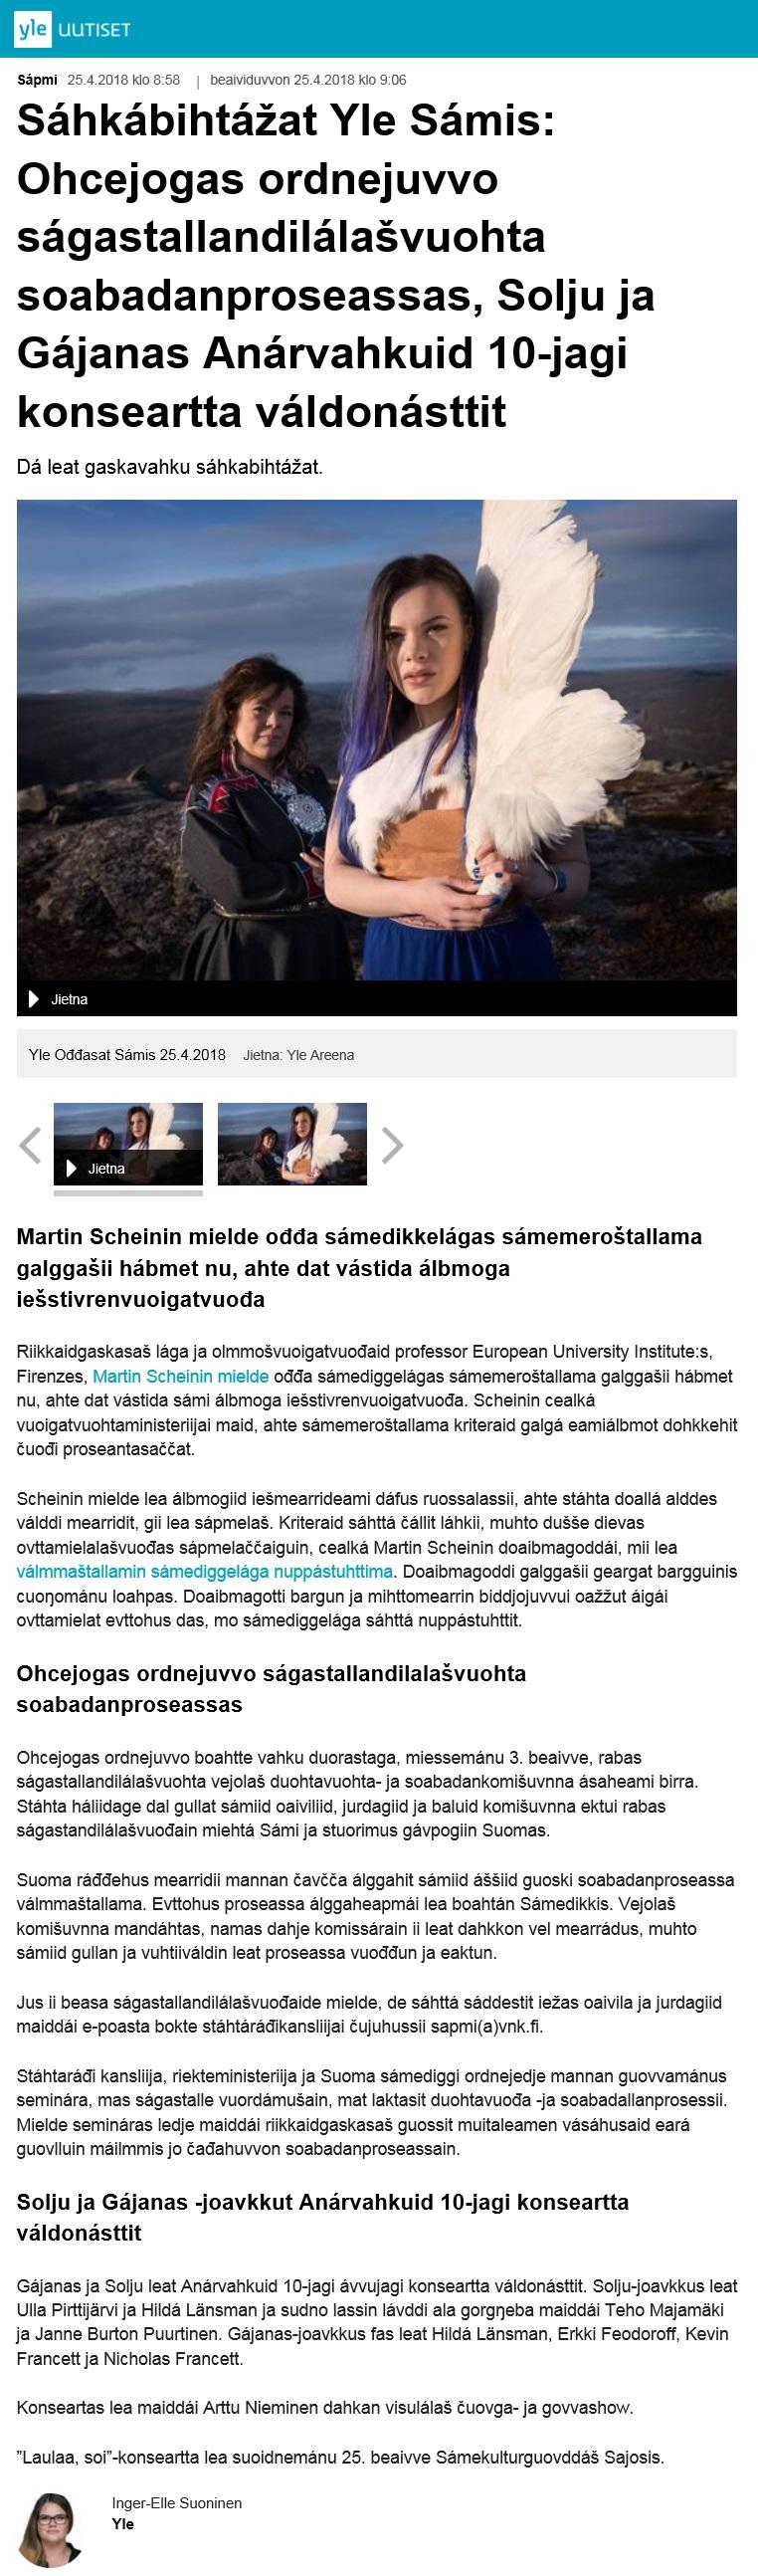 Yle Ođđasat Sámis (Finland), 25.4.2018